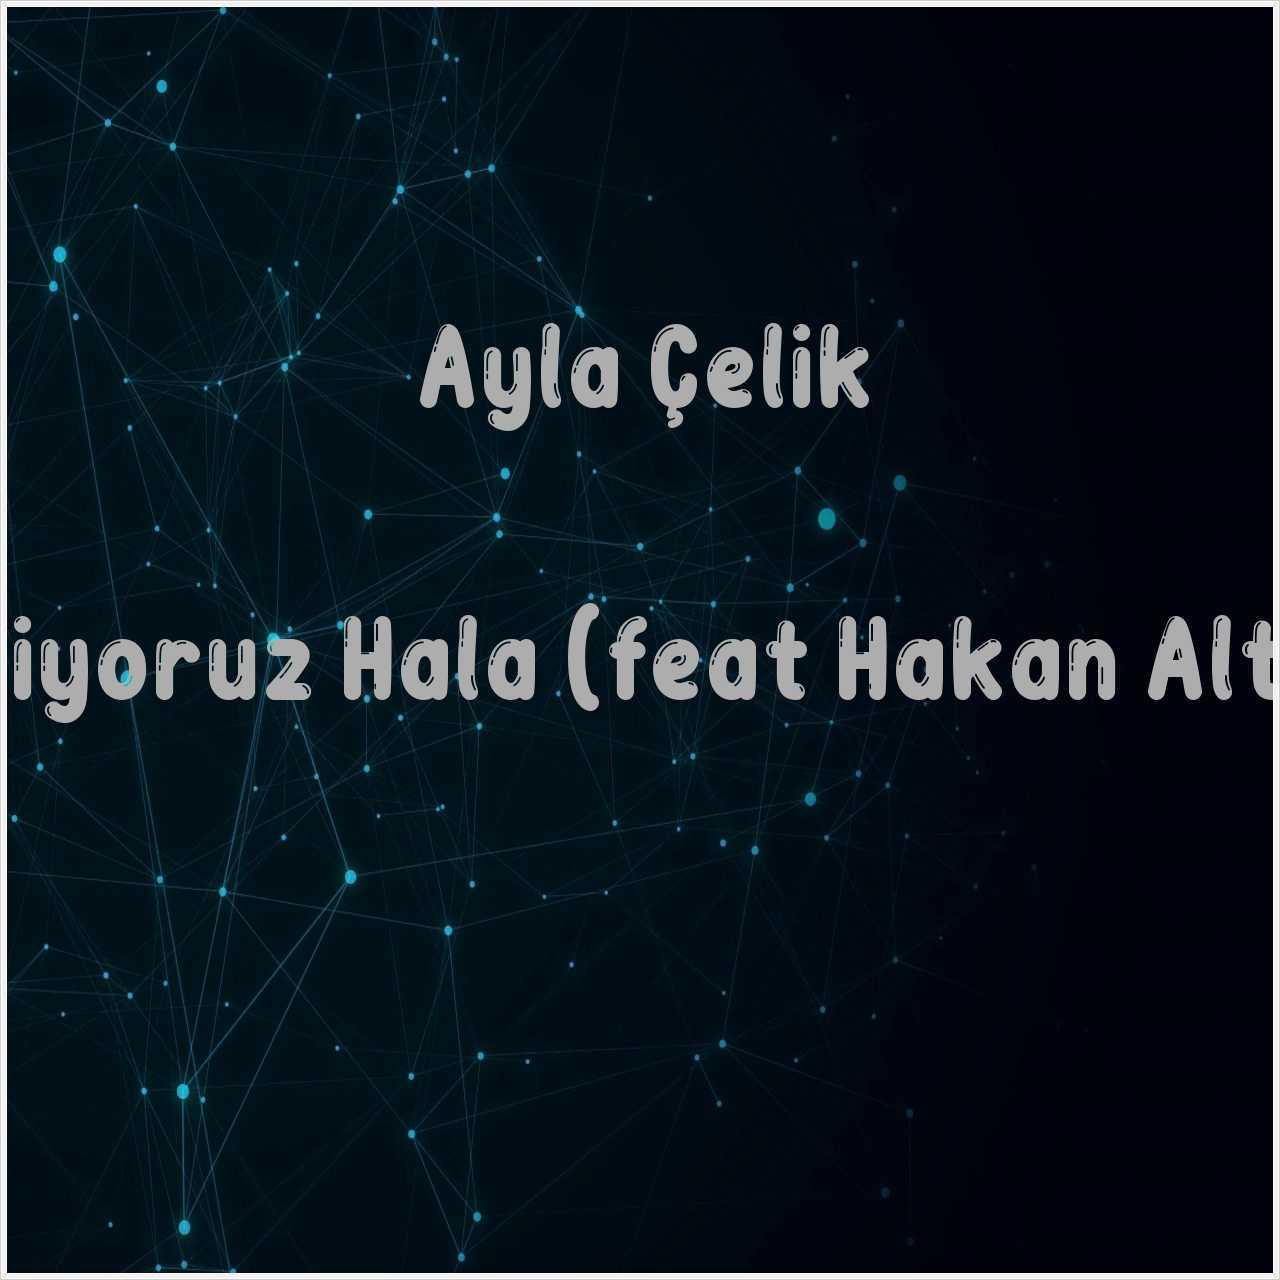 دانلود آهنگ جدید Ayla Çelik به نام Seviyoruz Hala (feat Hakan Altun)